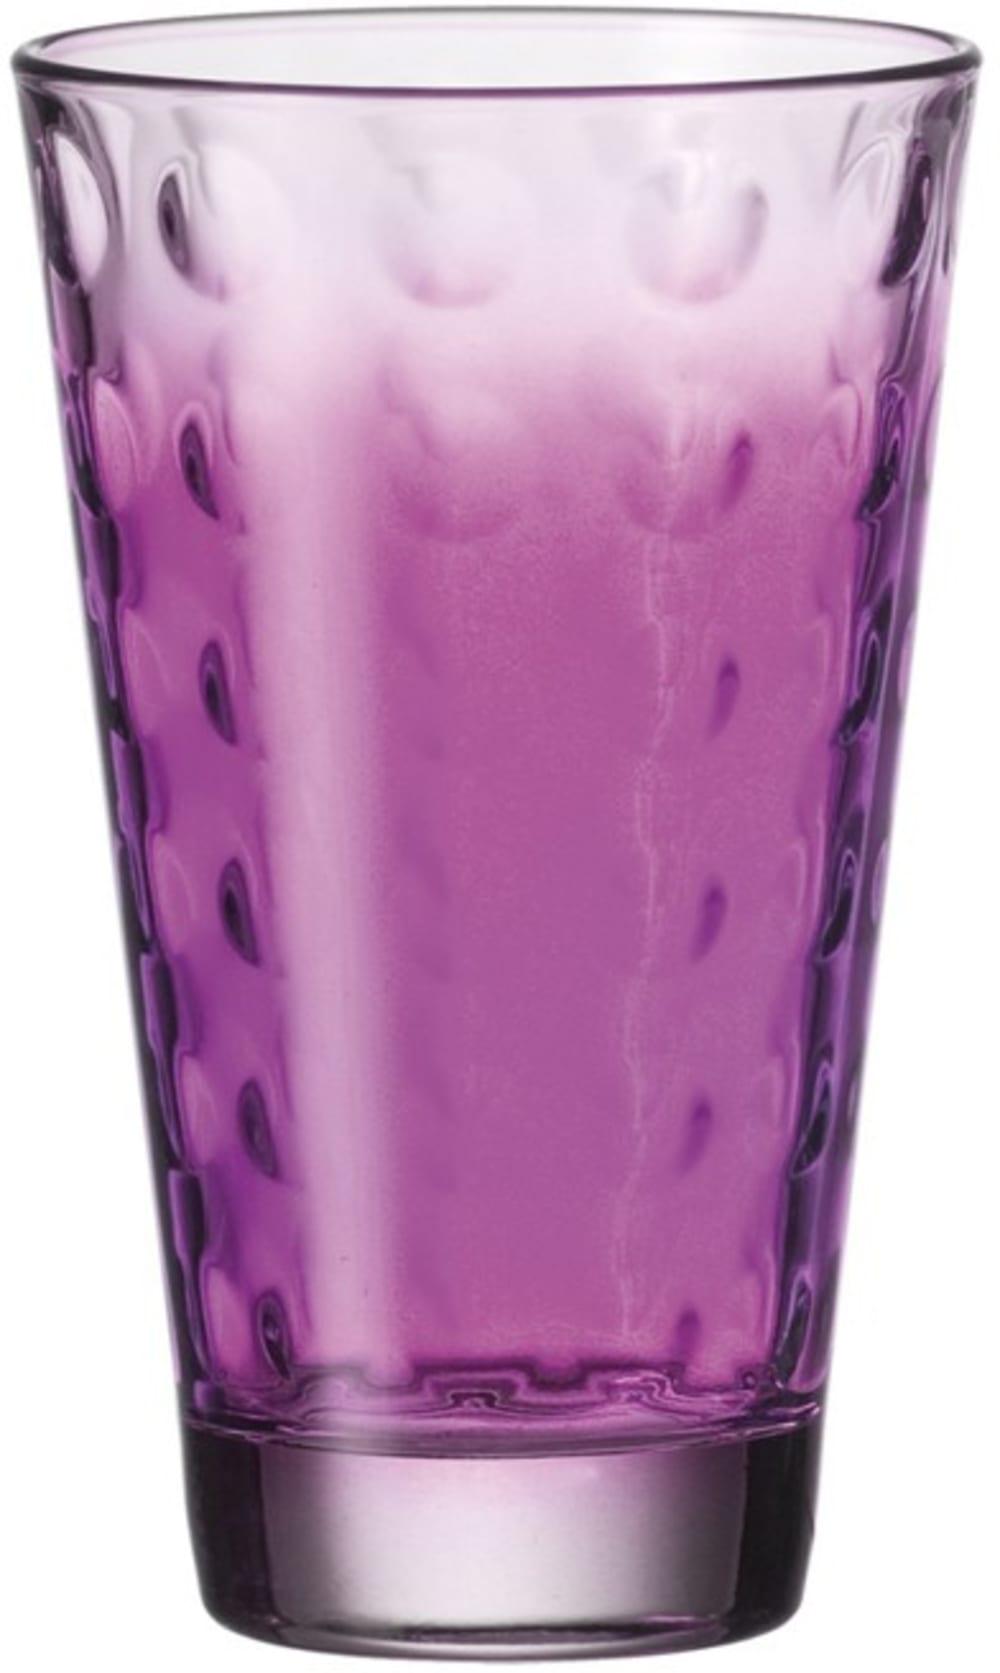 LO - Szklanka wysoka OPTIC fioletowa 300 ml